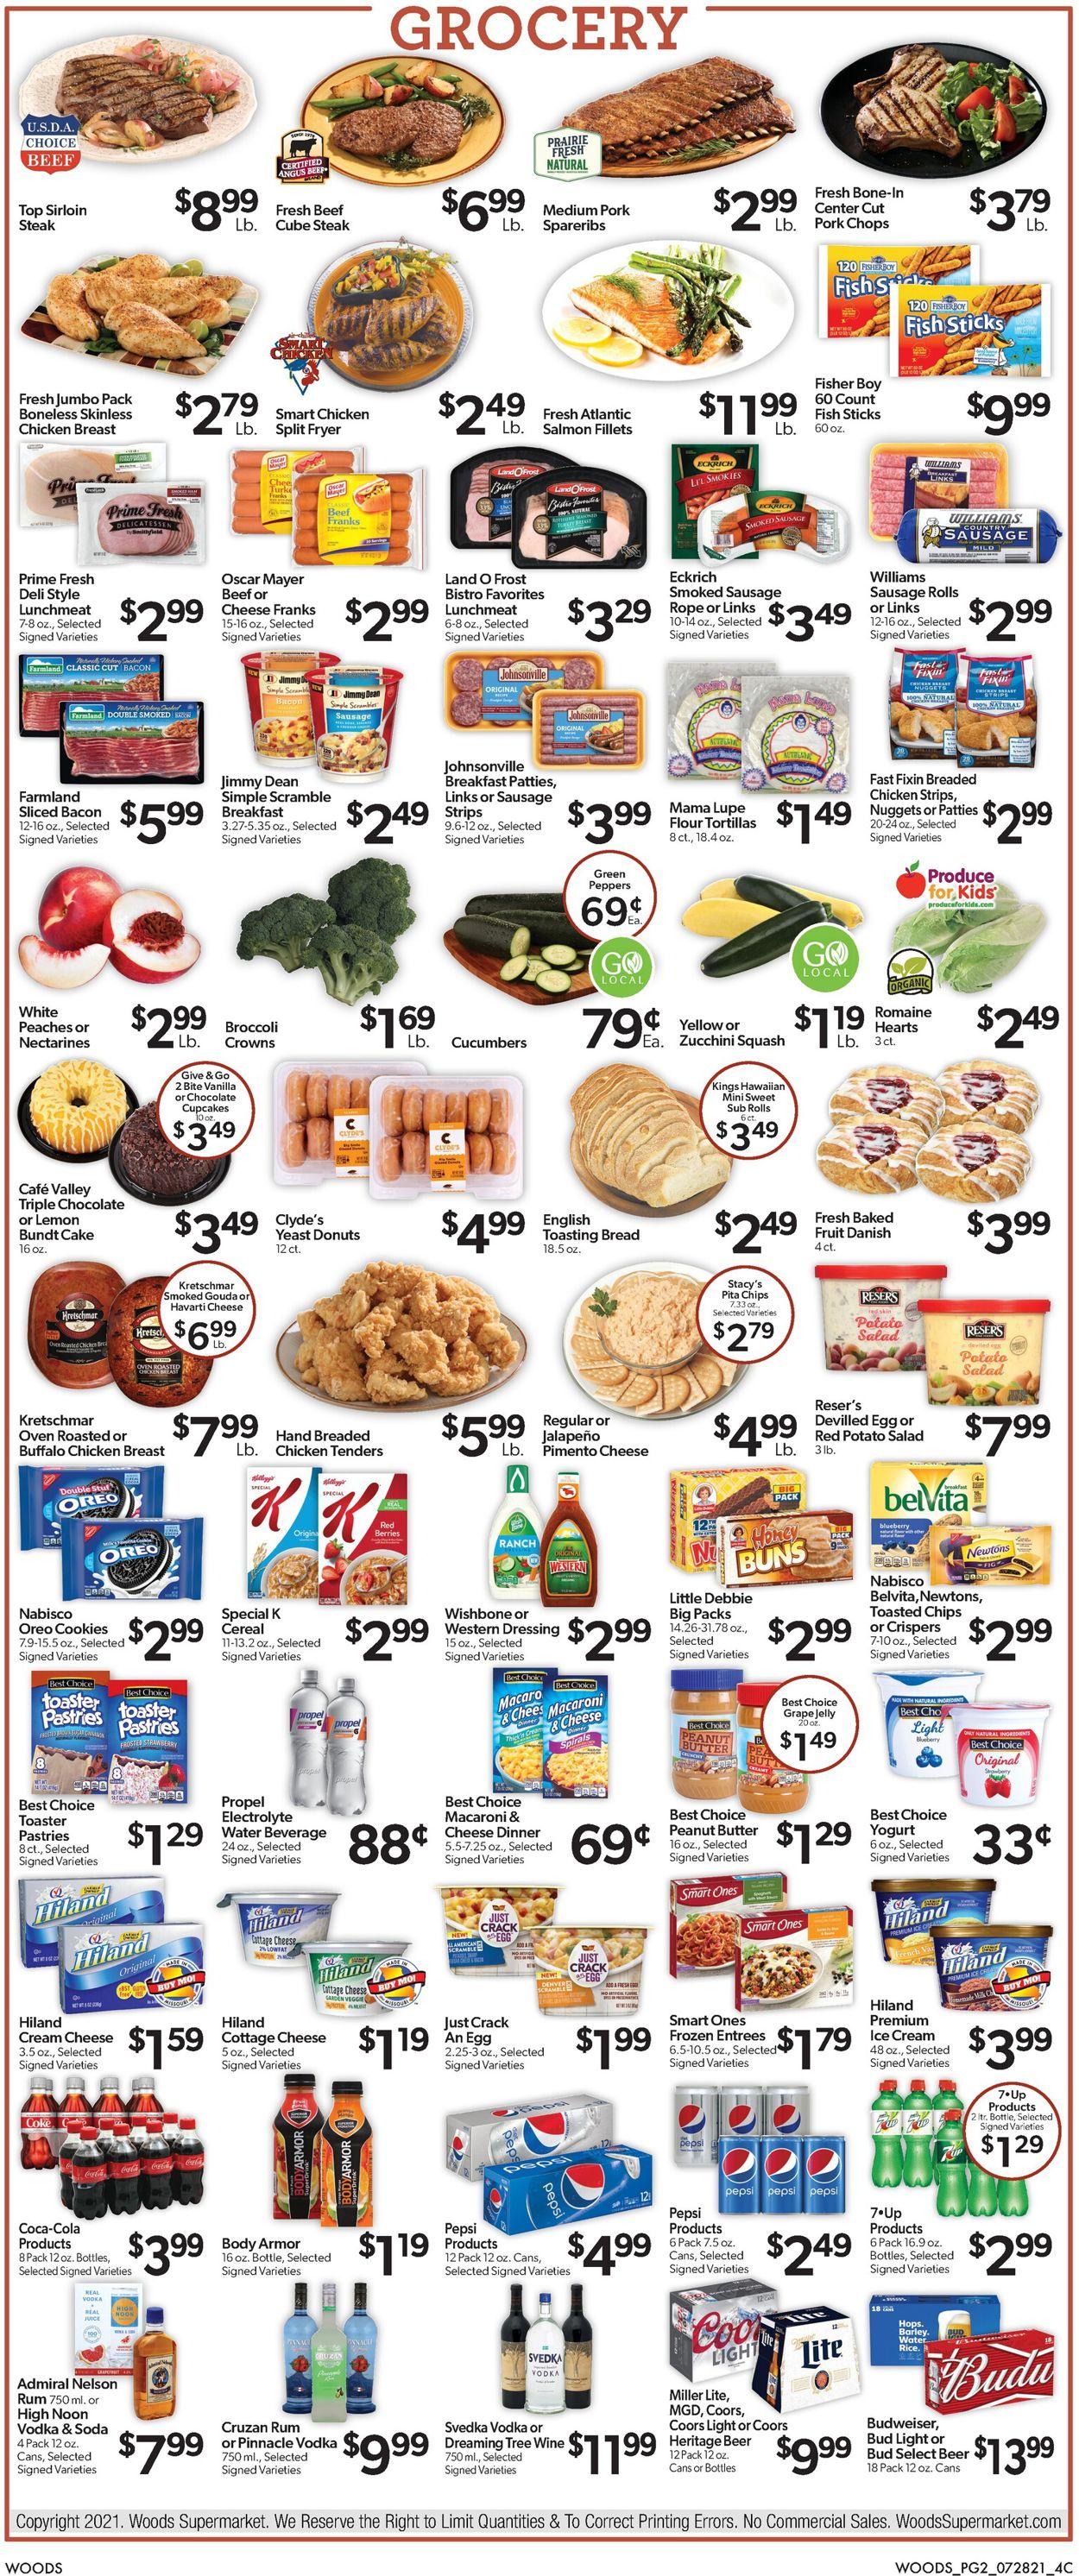 Woods Supermarket Weekly Ad Circular - valid 07/28-08/03/2021 (Page 2)